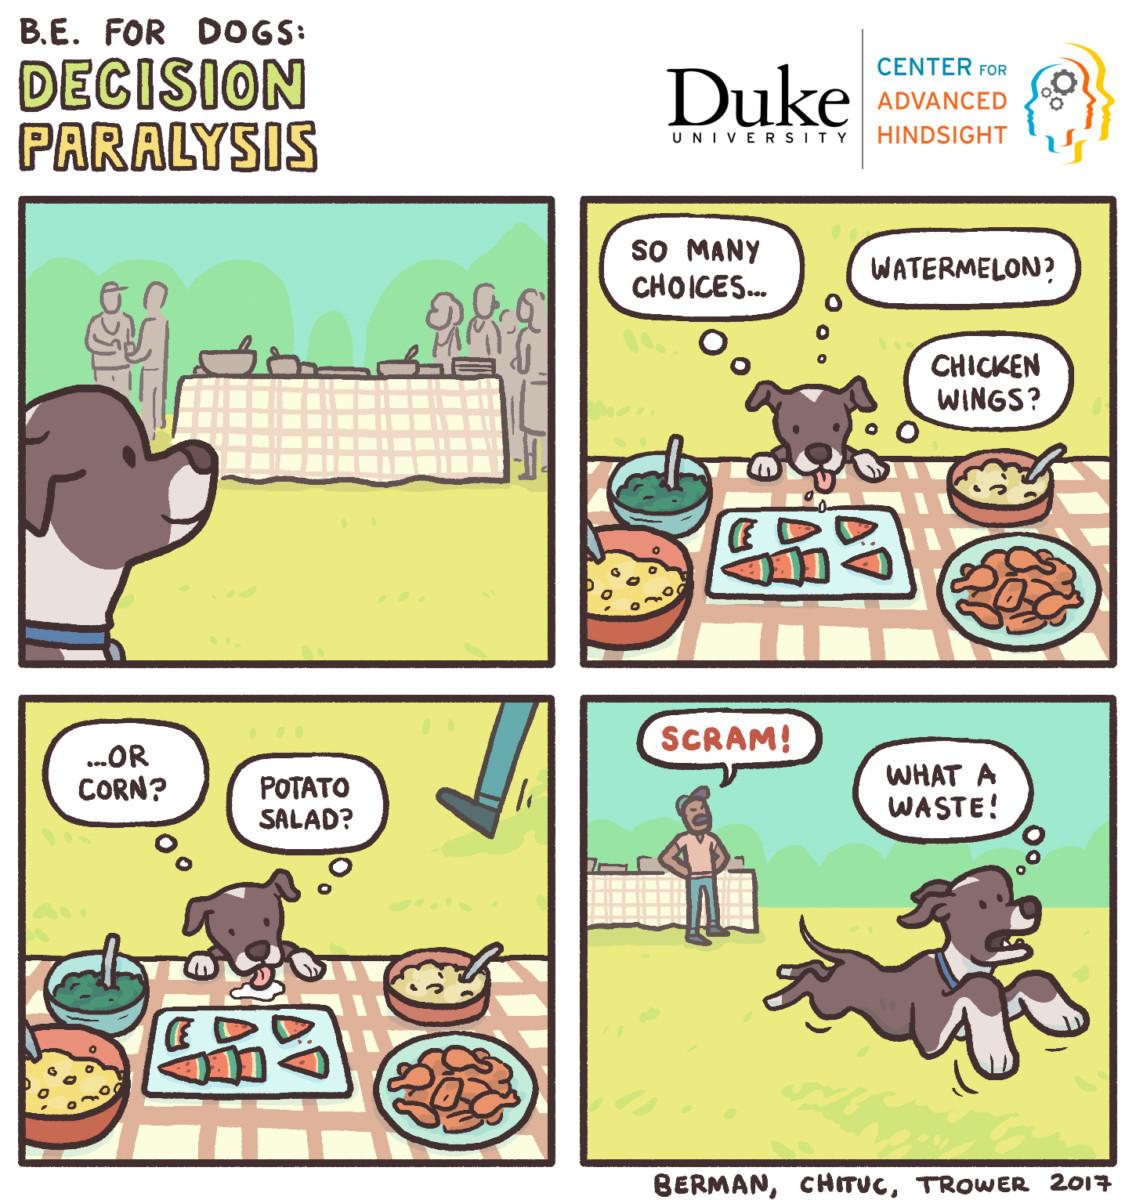 decision paralysis | Behavioral economics | Duke university